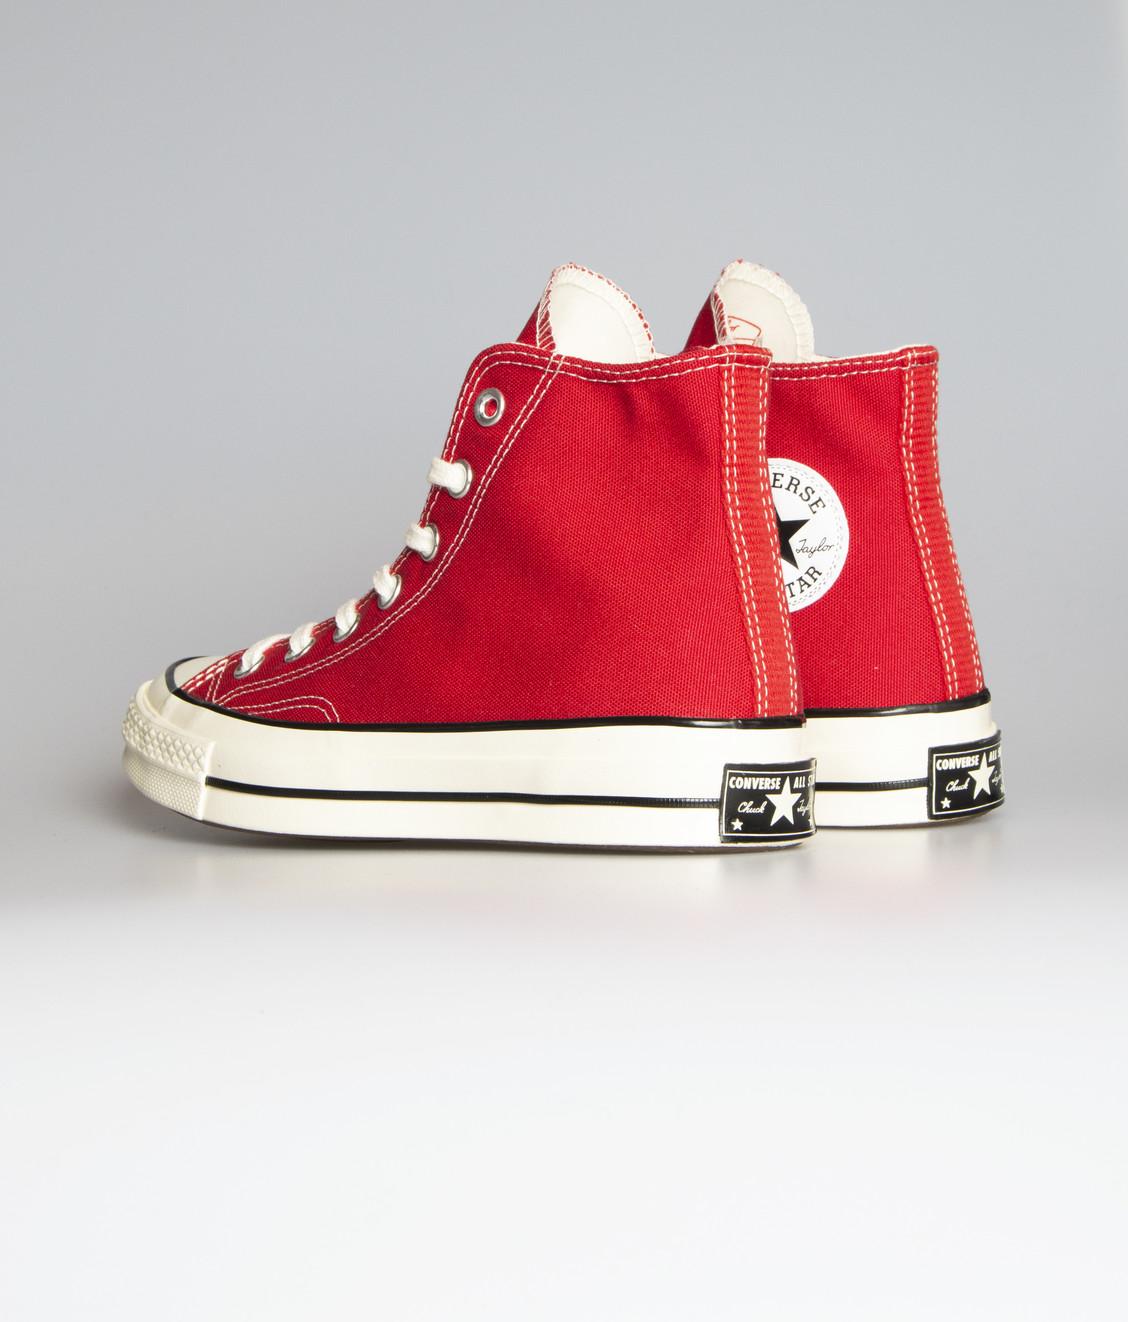 Converse Chuck 70 Hi Enamel Red